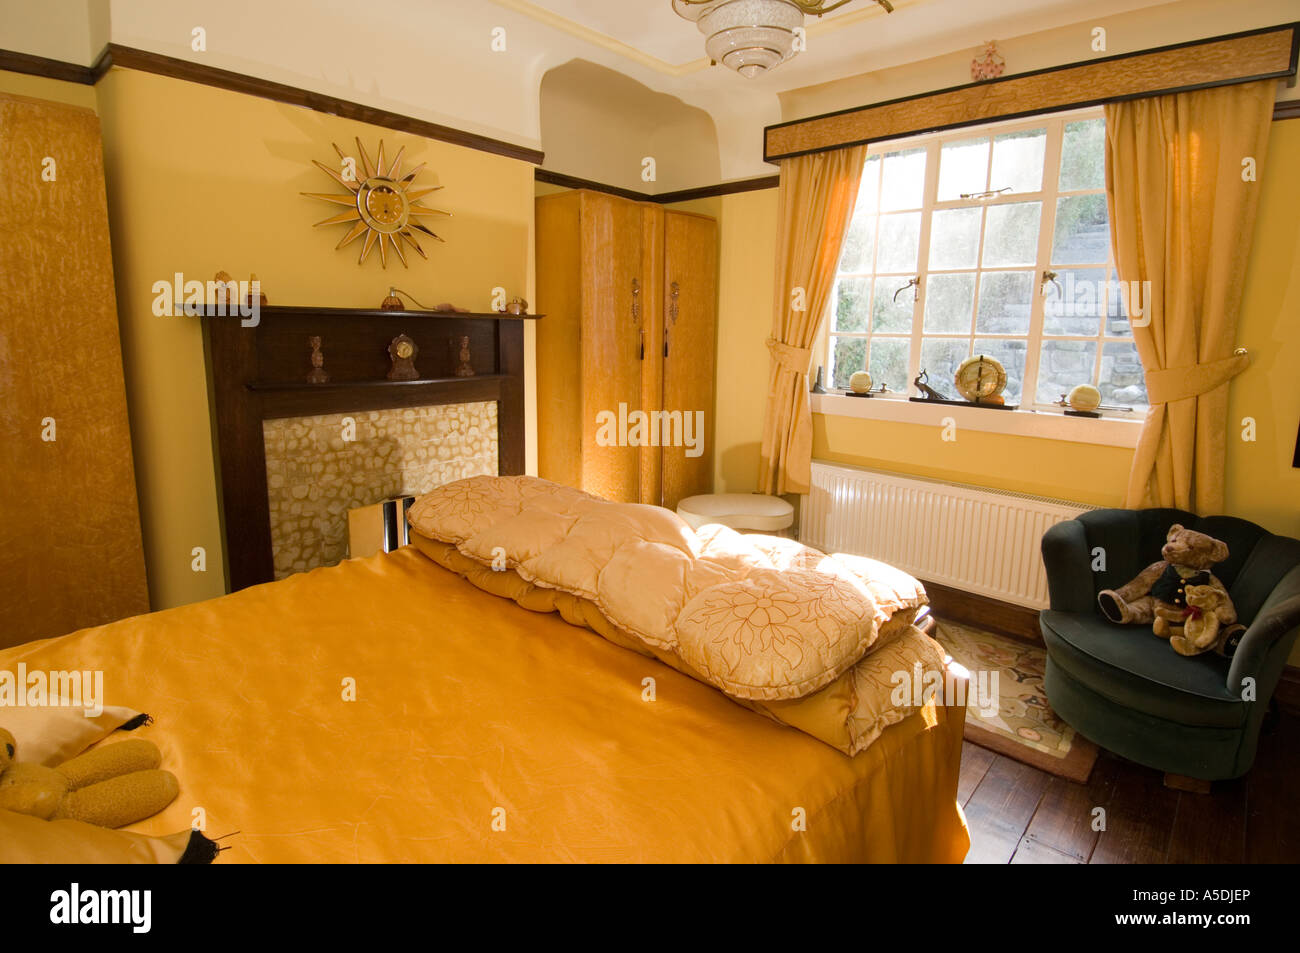 Art Deco House Interior. refurbished art deco nouveau 1930 s house interior bedroom morning warm  gold colour